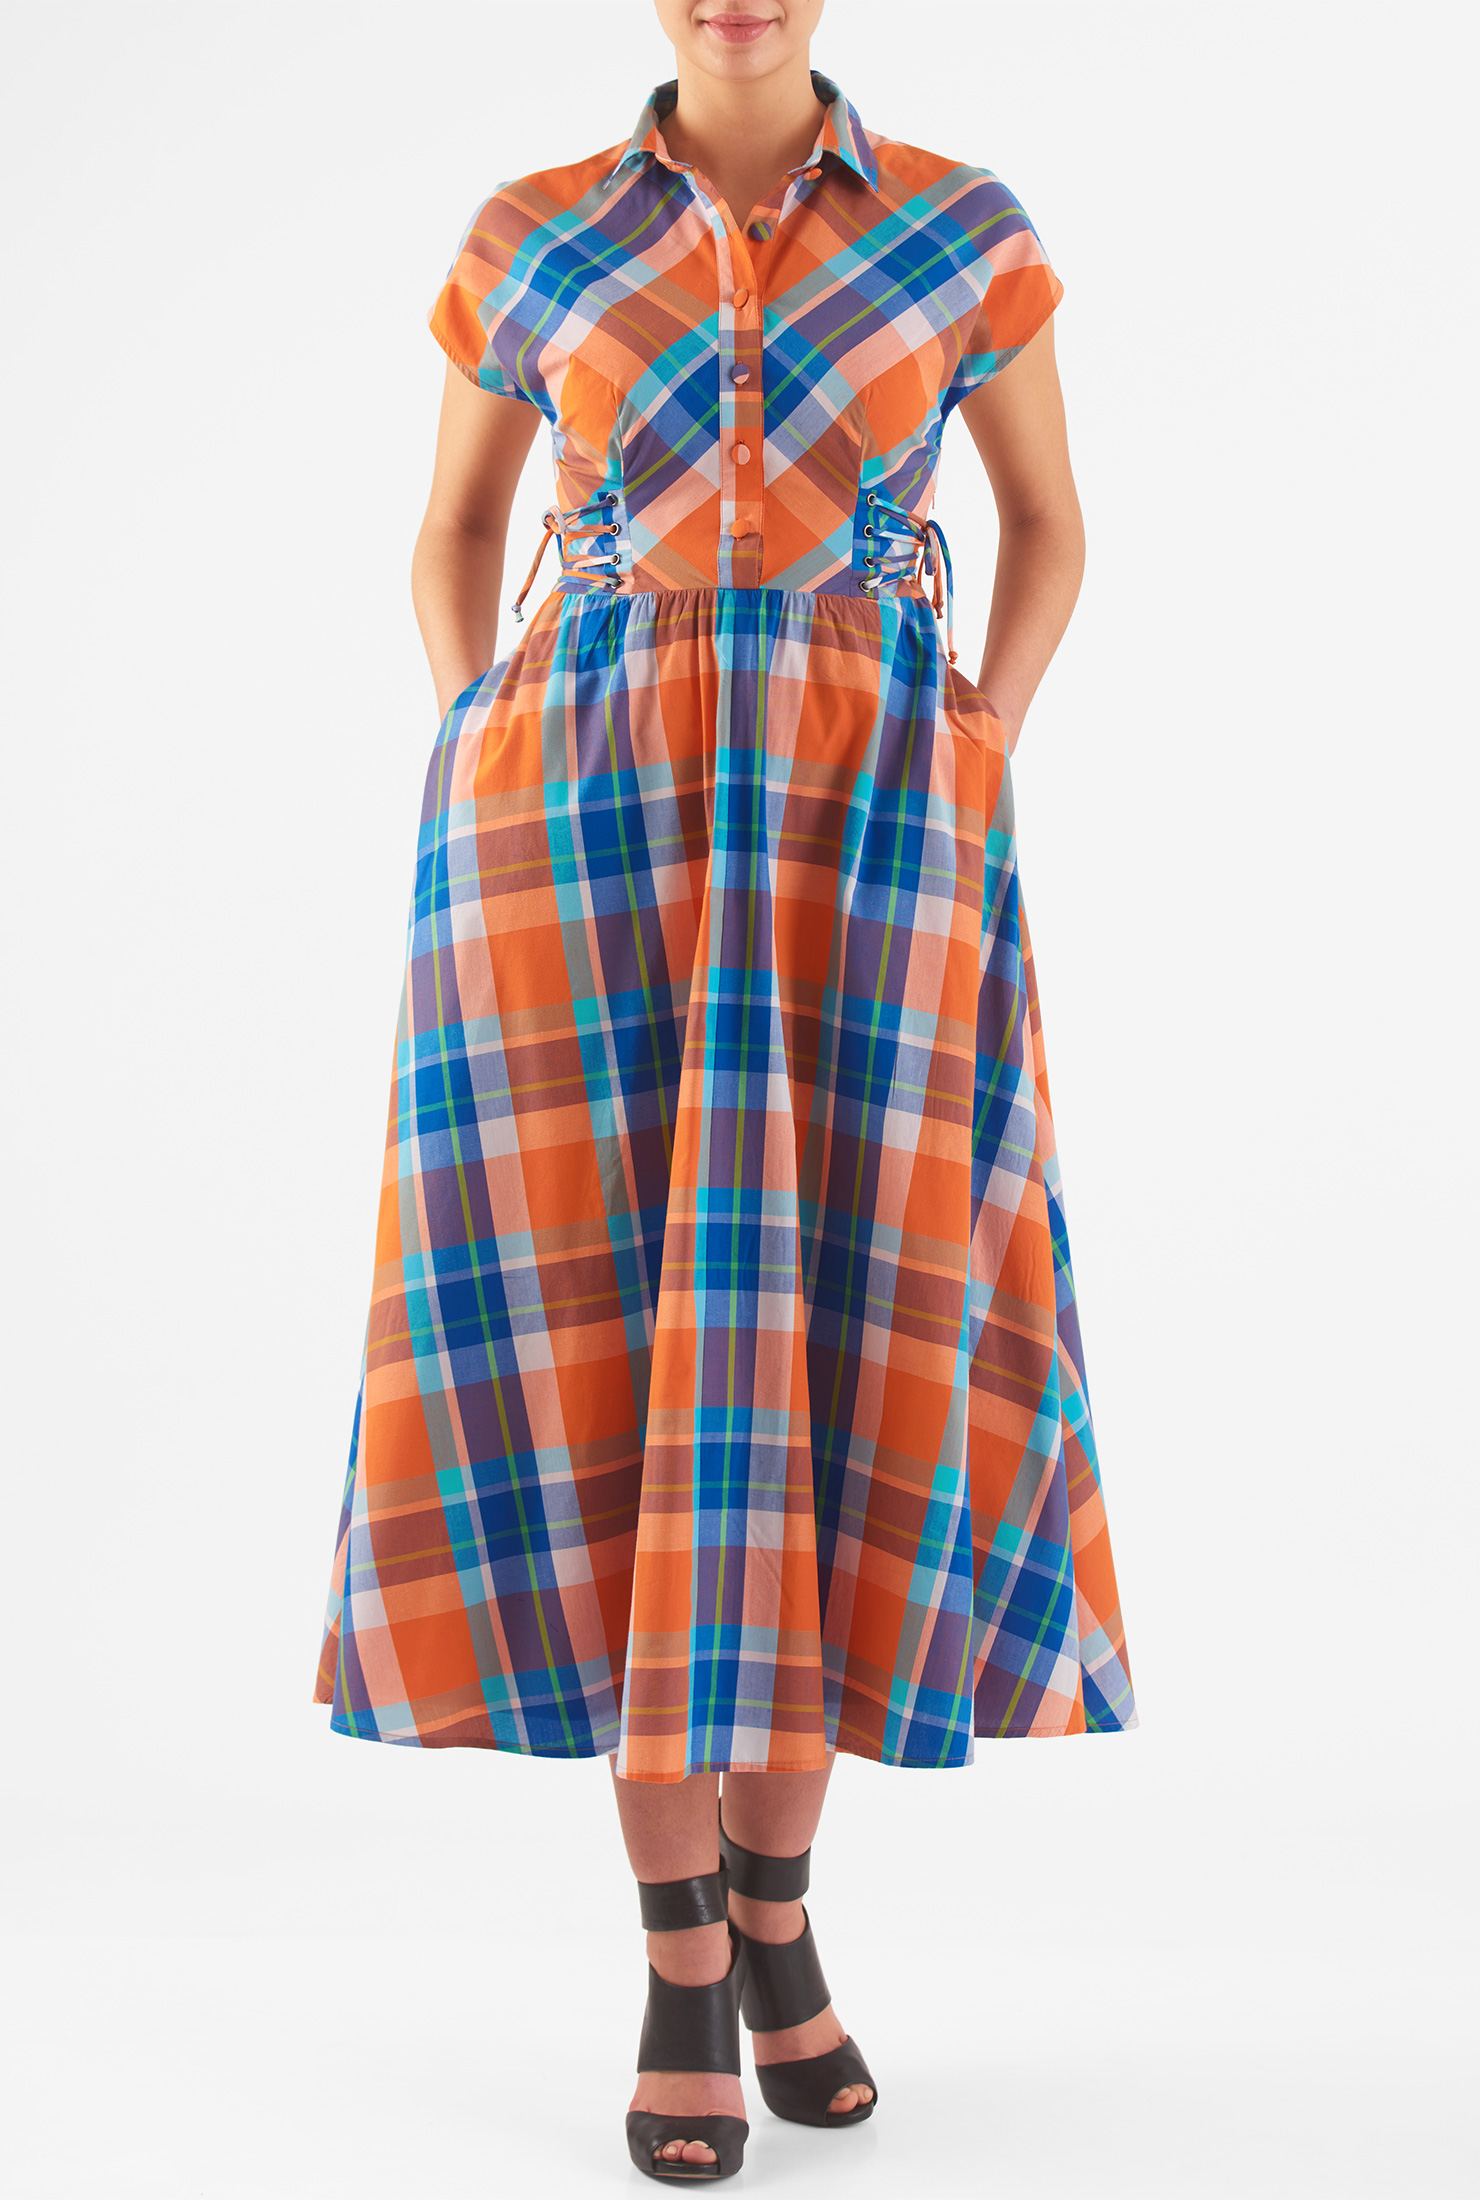 1940s Day Dresses eShakti Womens Lace-up cotton check midi shirtdress $66.95 AT vintagedancer.com